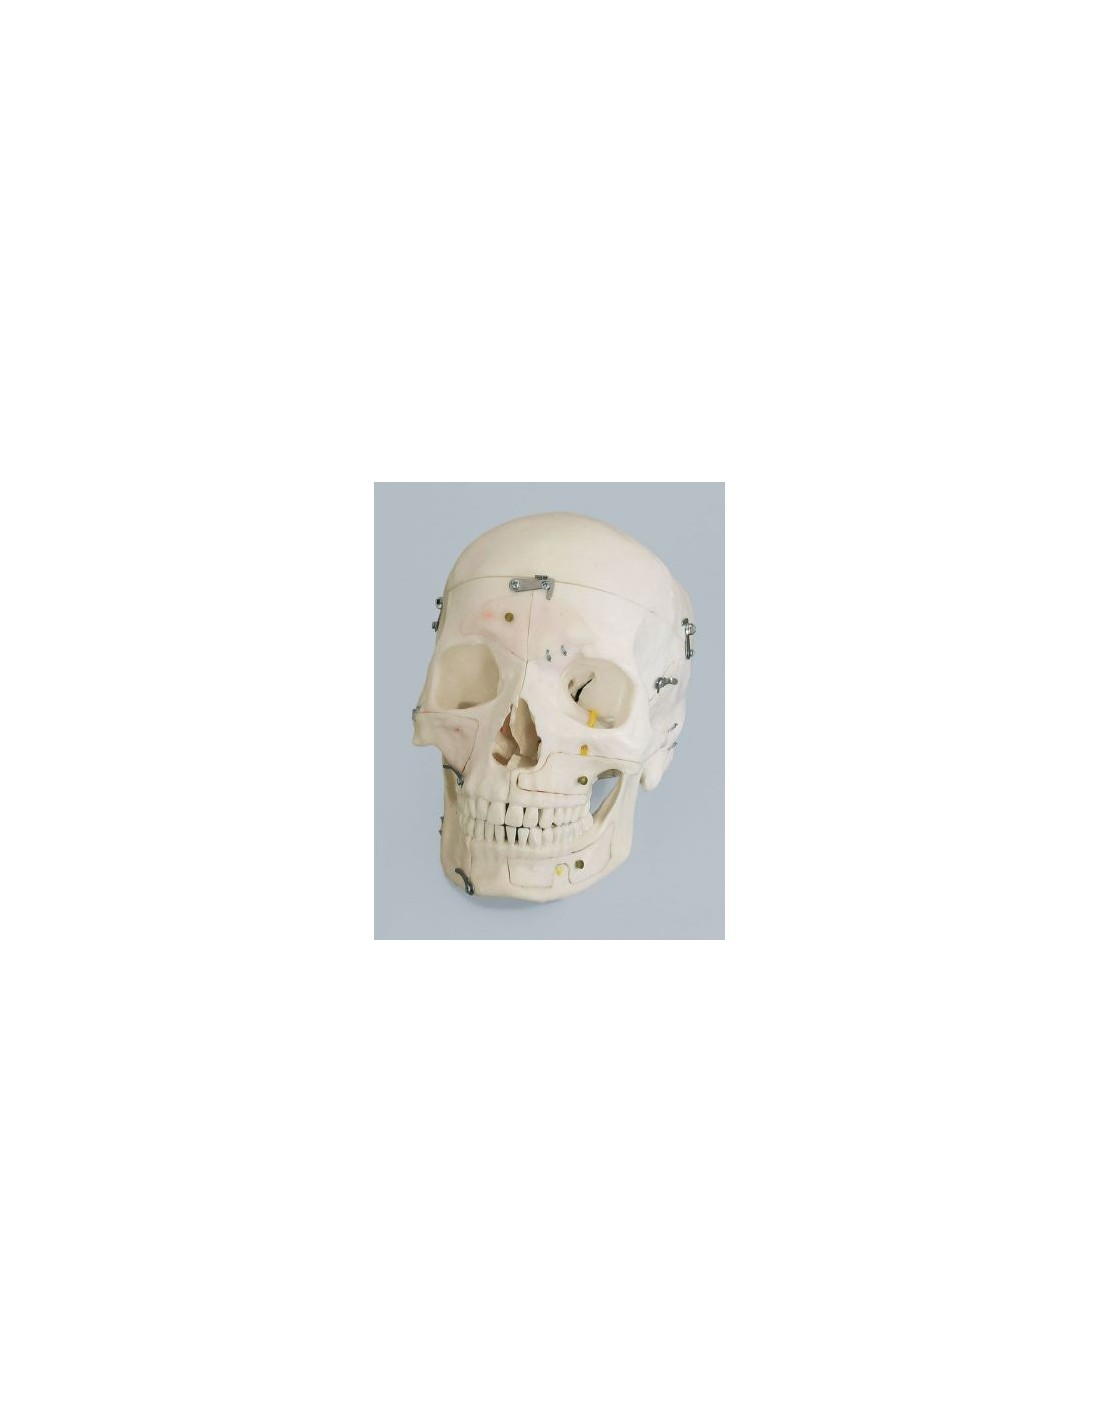 Charmant Nnh Anatomie Ideen - Anatomie Ideen - finotti.info